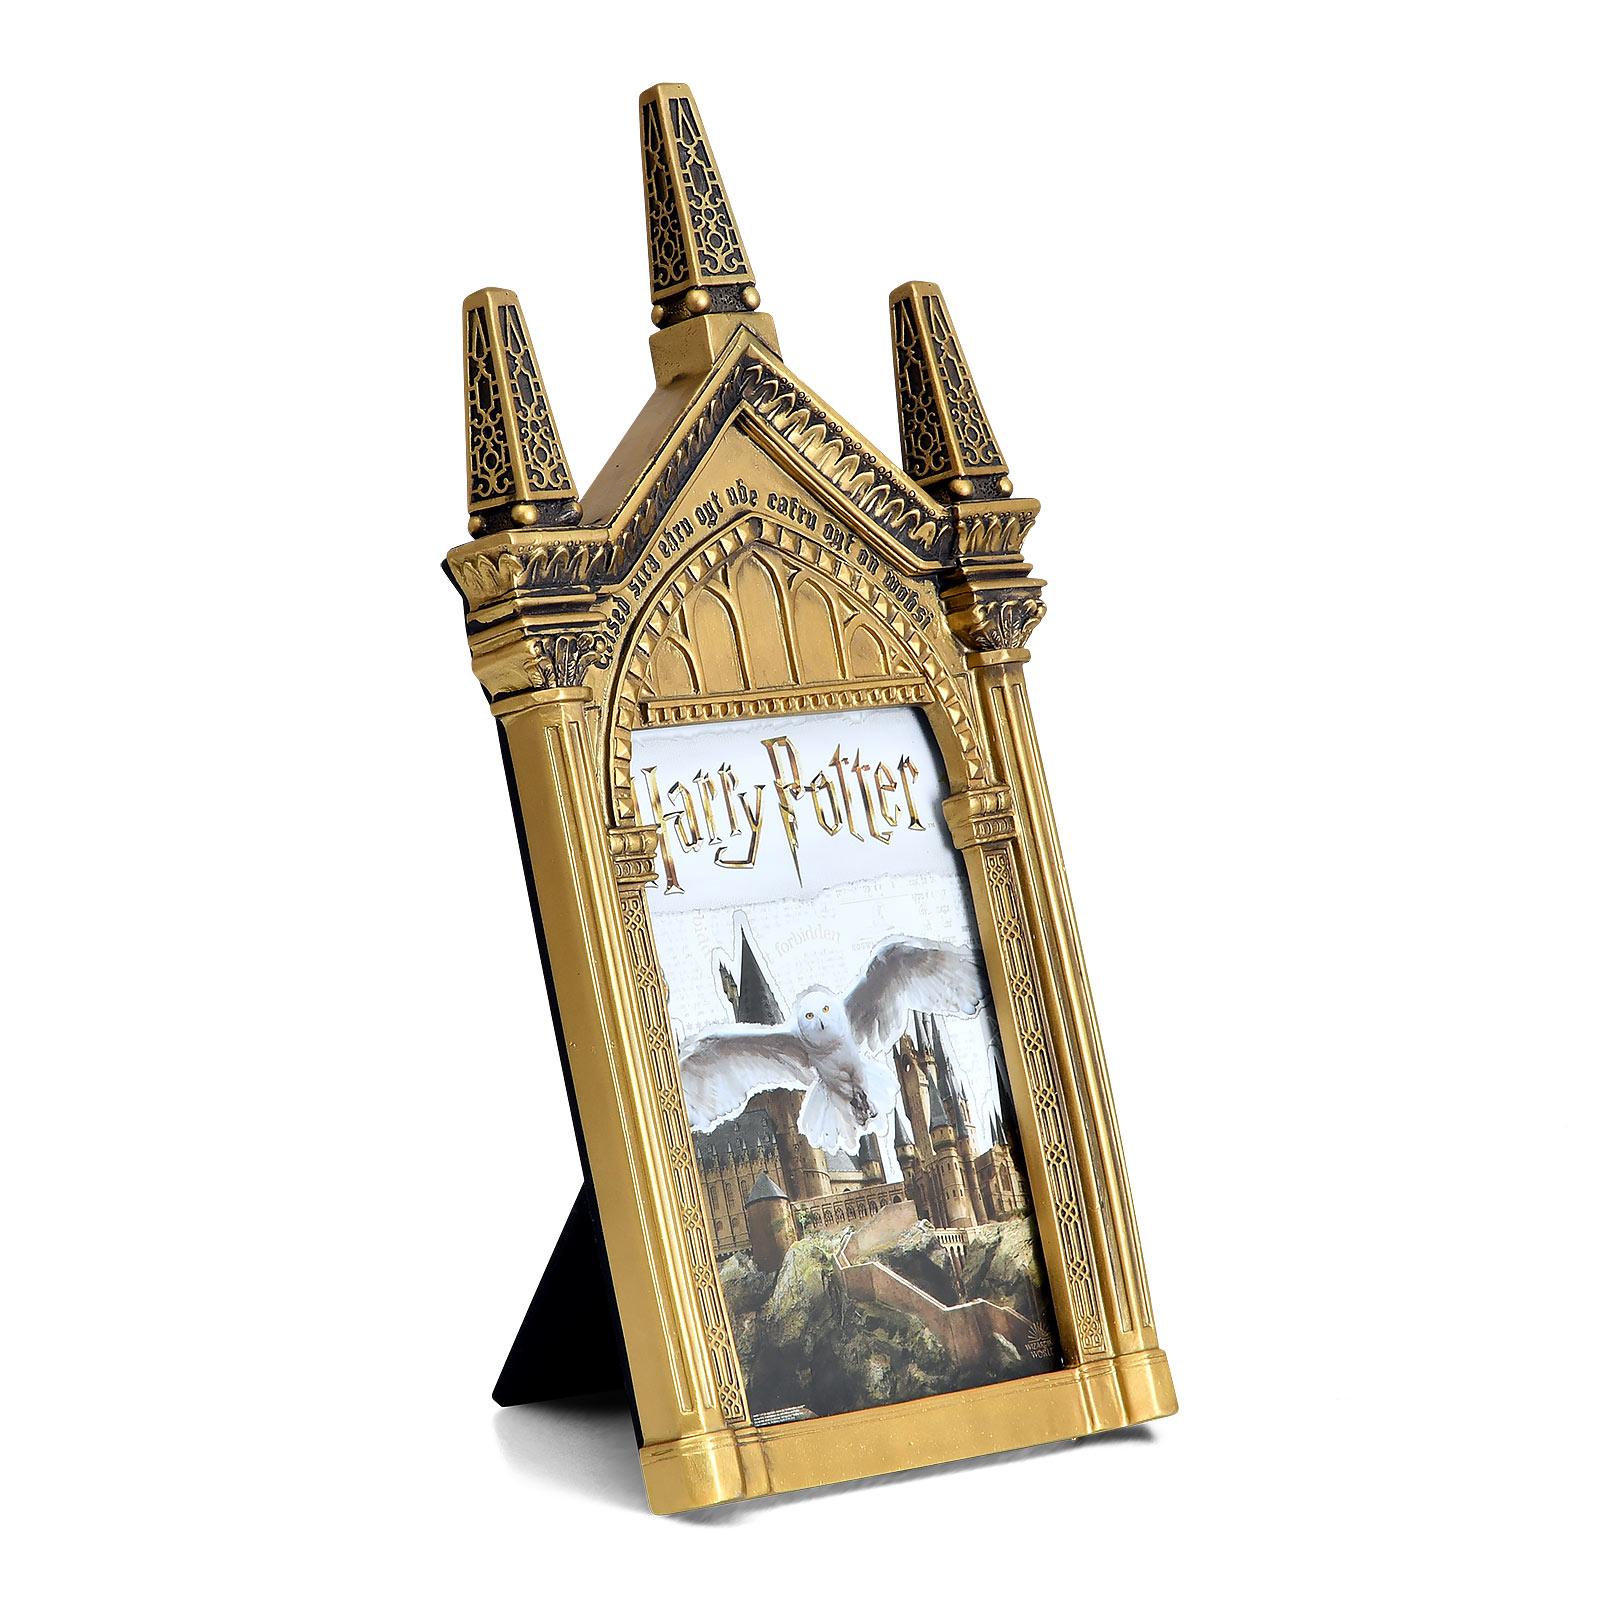 Harry Potter - Spiegel Nerhegeb Bilderrahmen